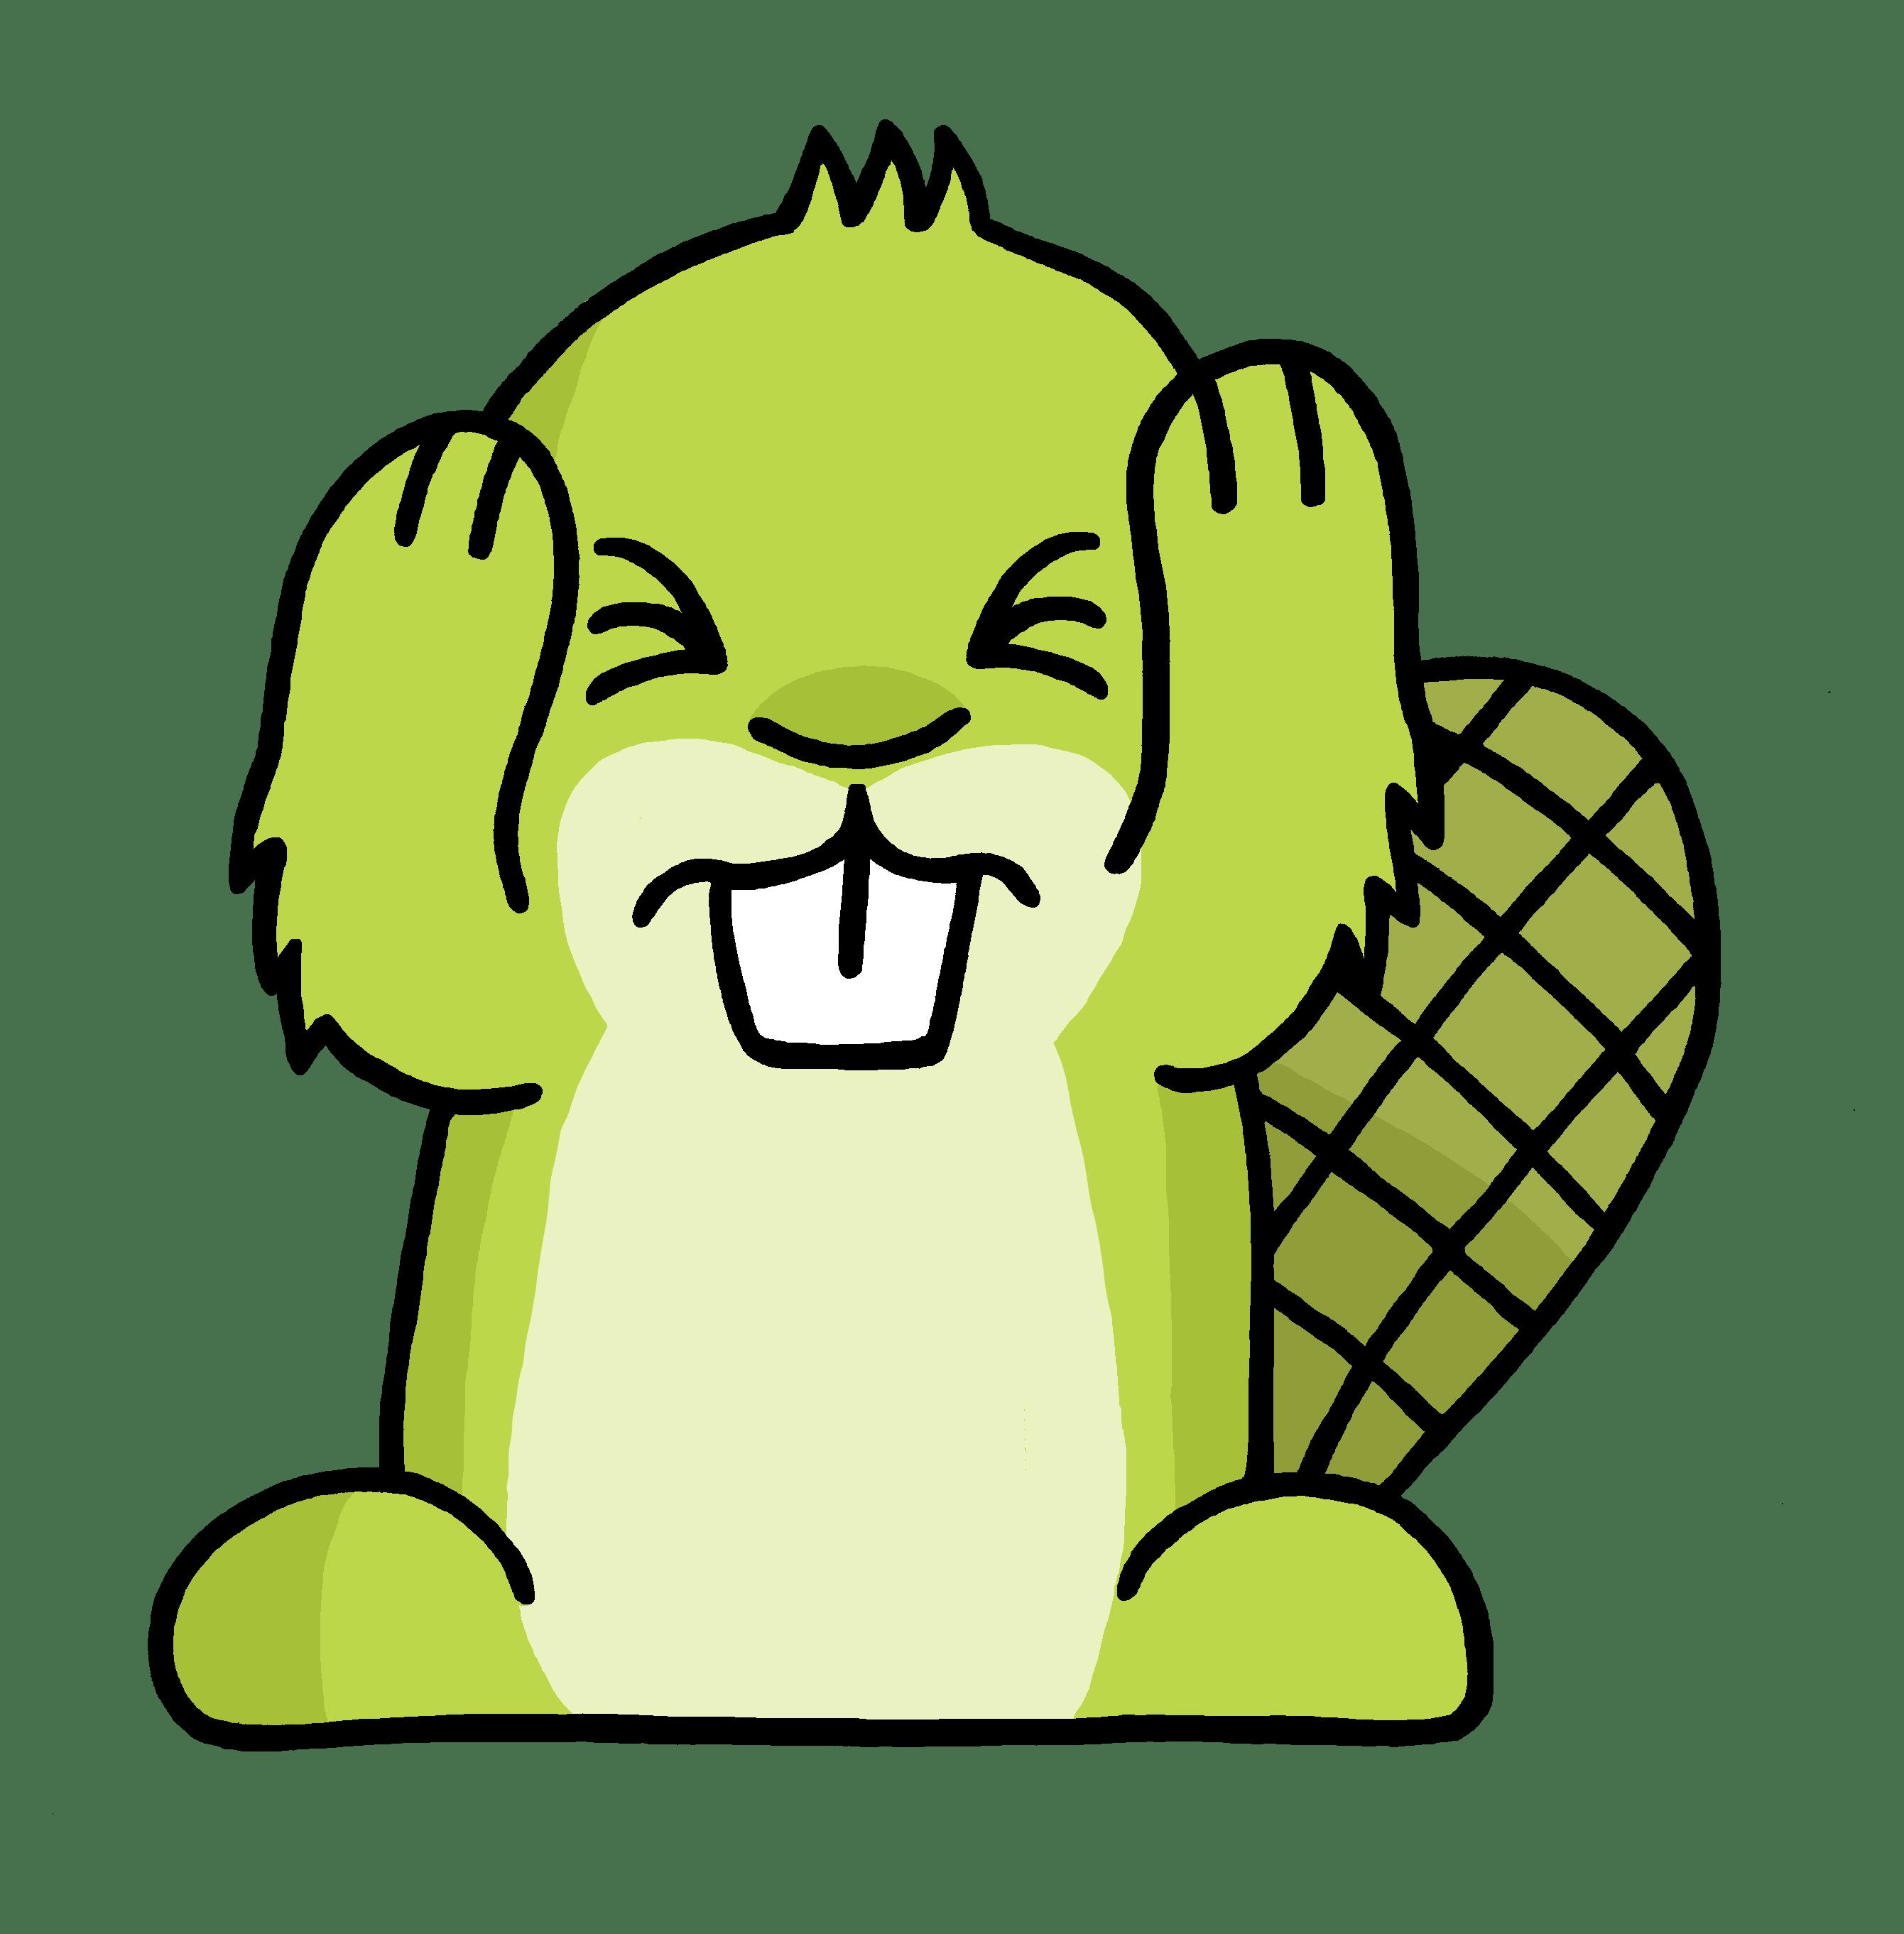 Devil clipart mascot. Cannot hear adsy transparent